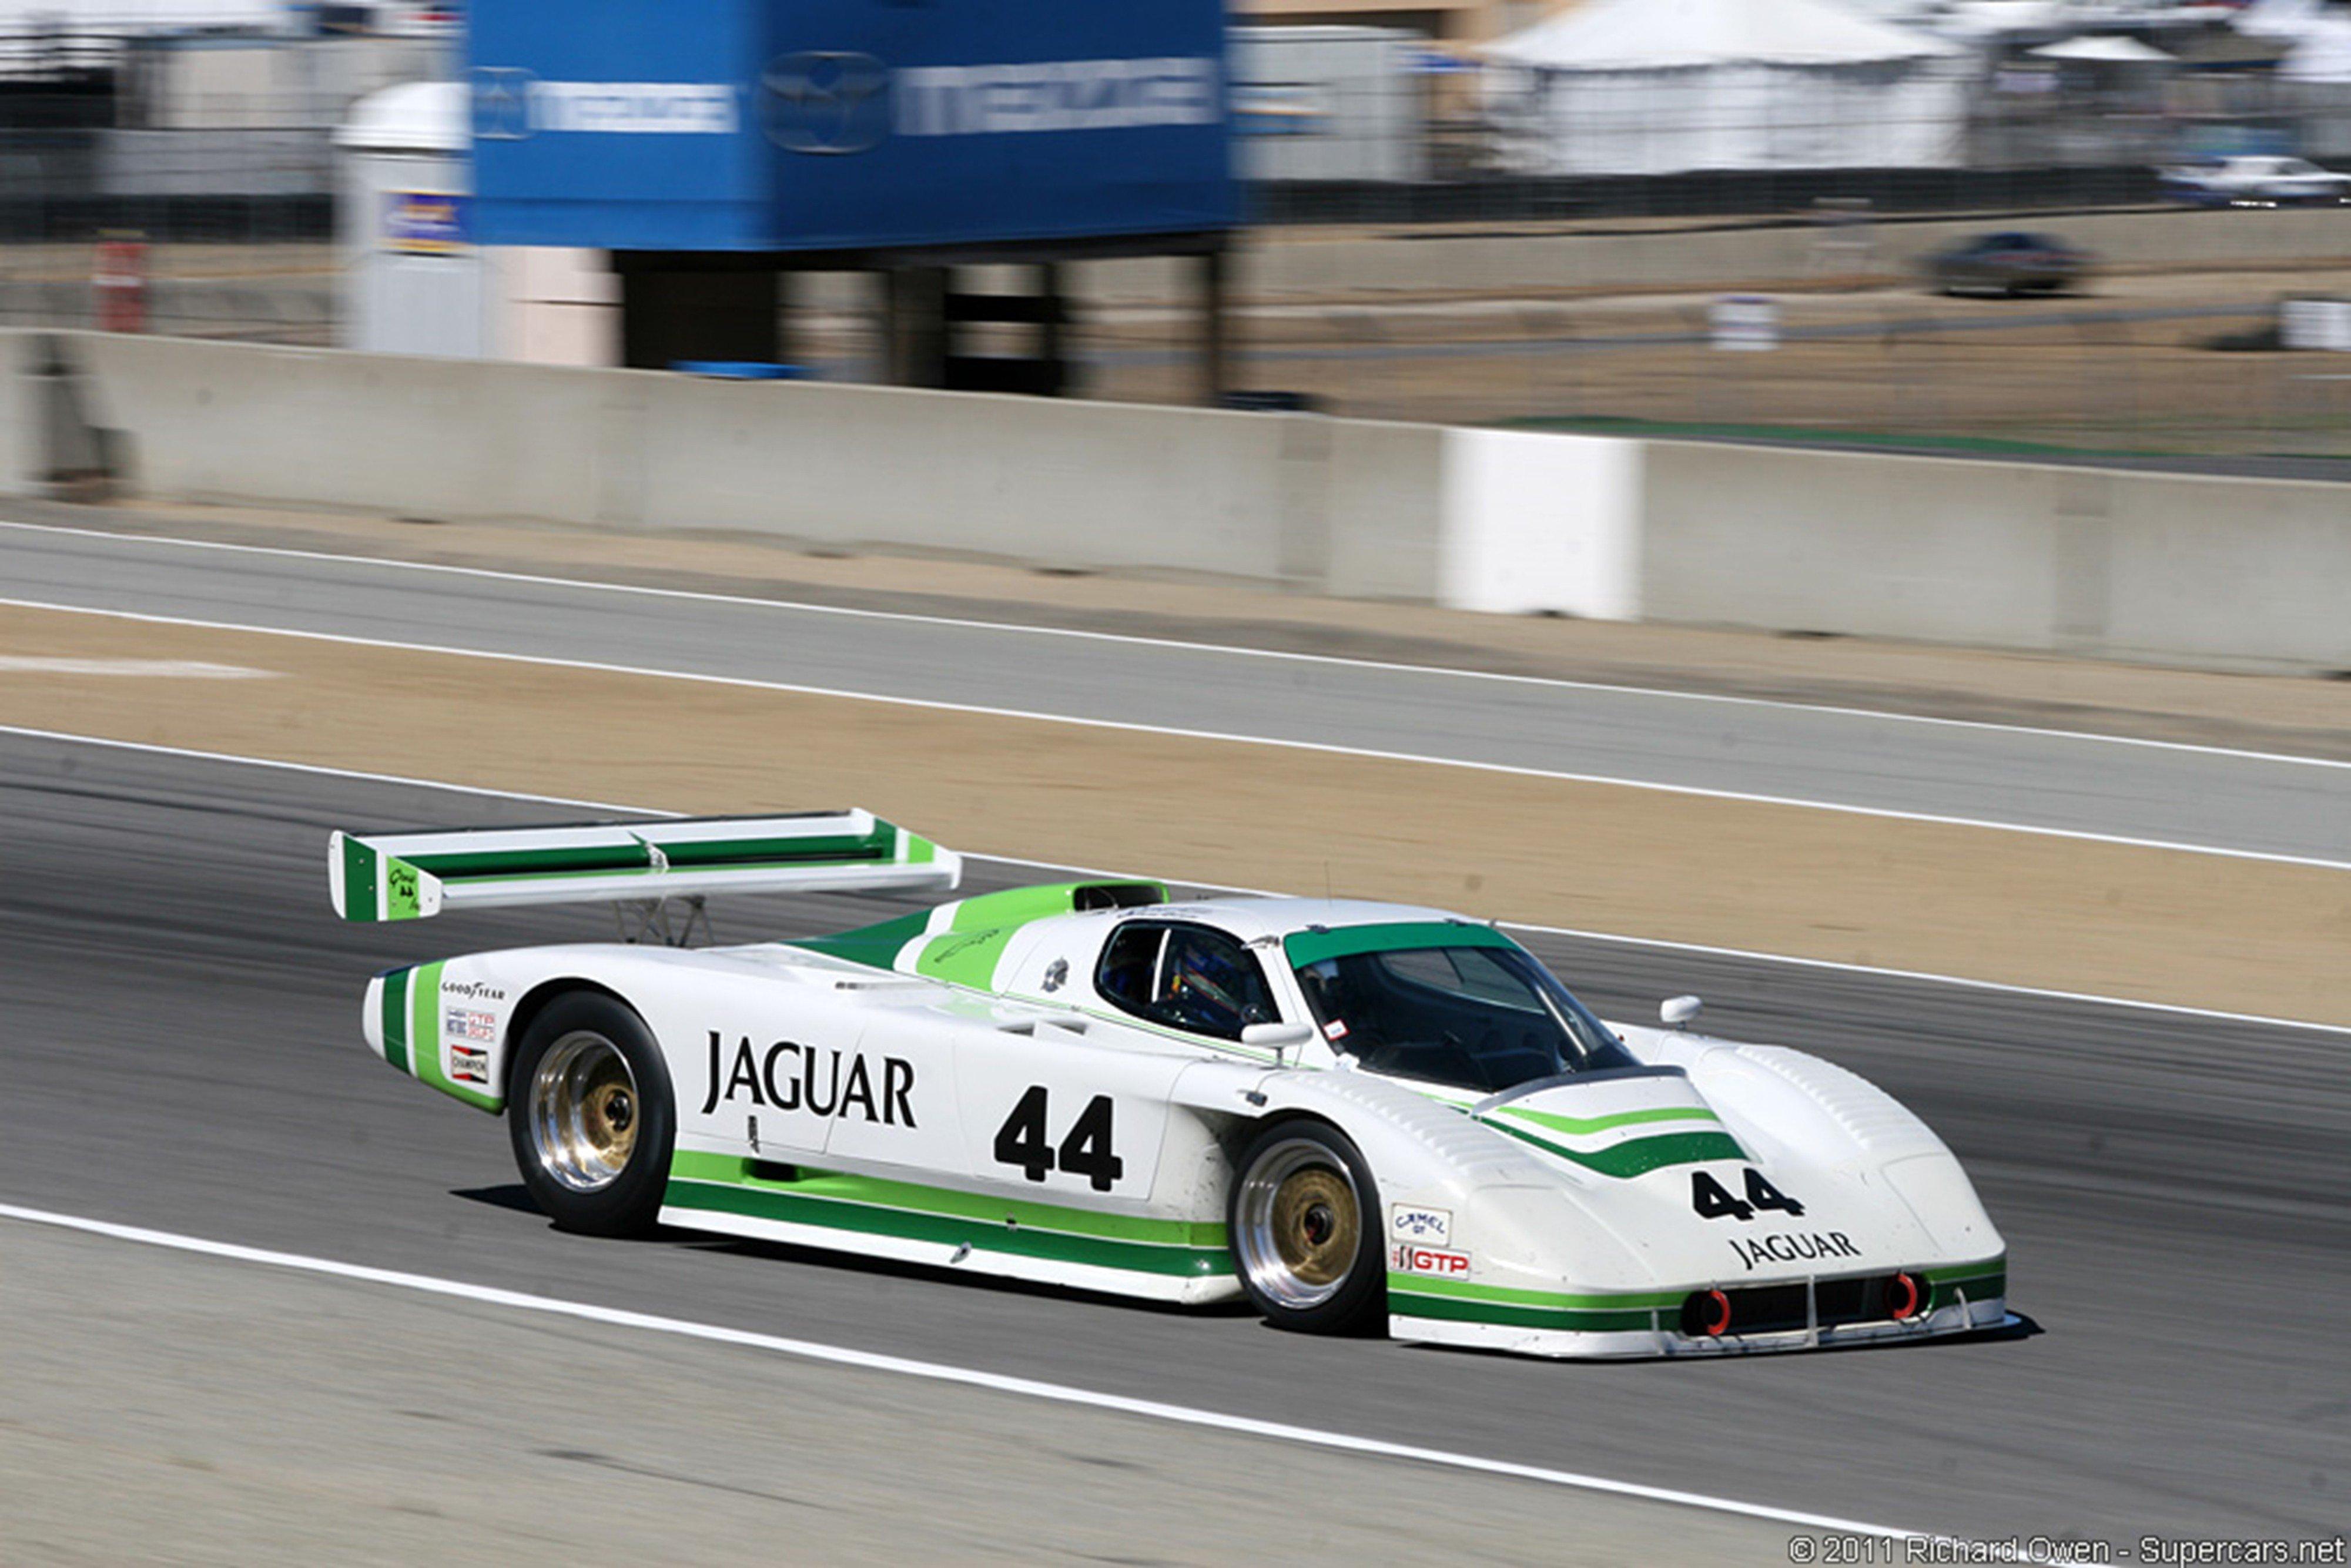 1986 jaguar xjr 7 race car classic vehicle racing retro le mans lmp1 4000x2668 12 wallpaper. Black Bedroom Furniture Sets. Home Design Ideas